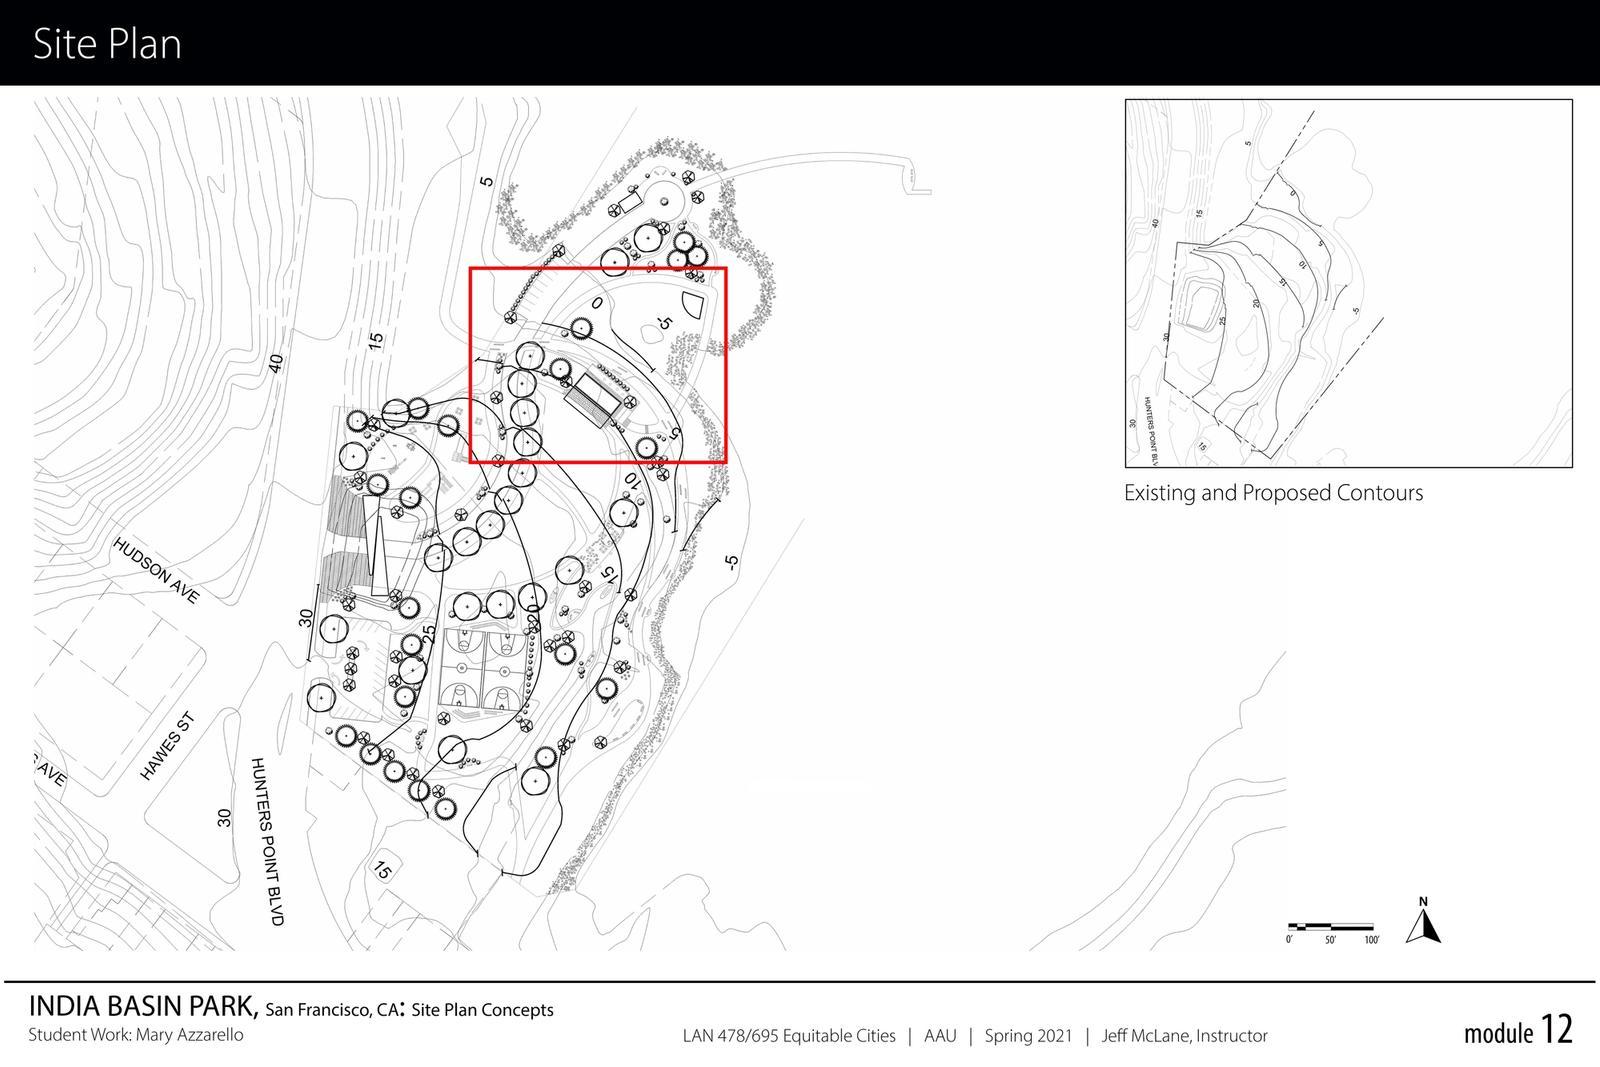 India Basin Park, San Francisco - Site Plan